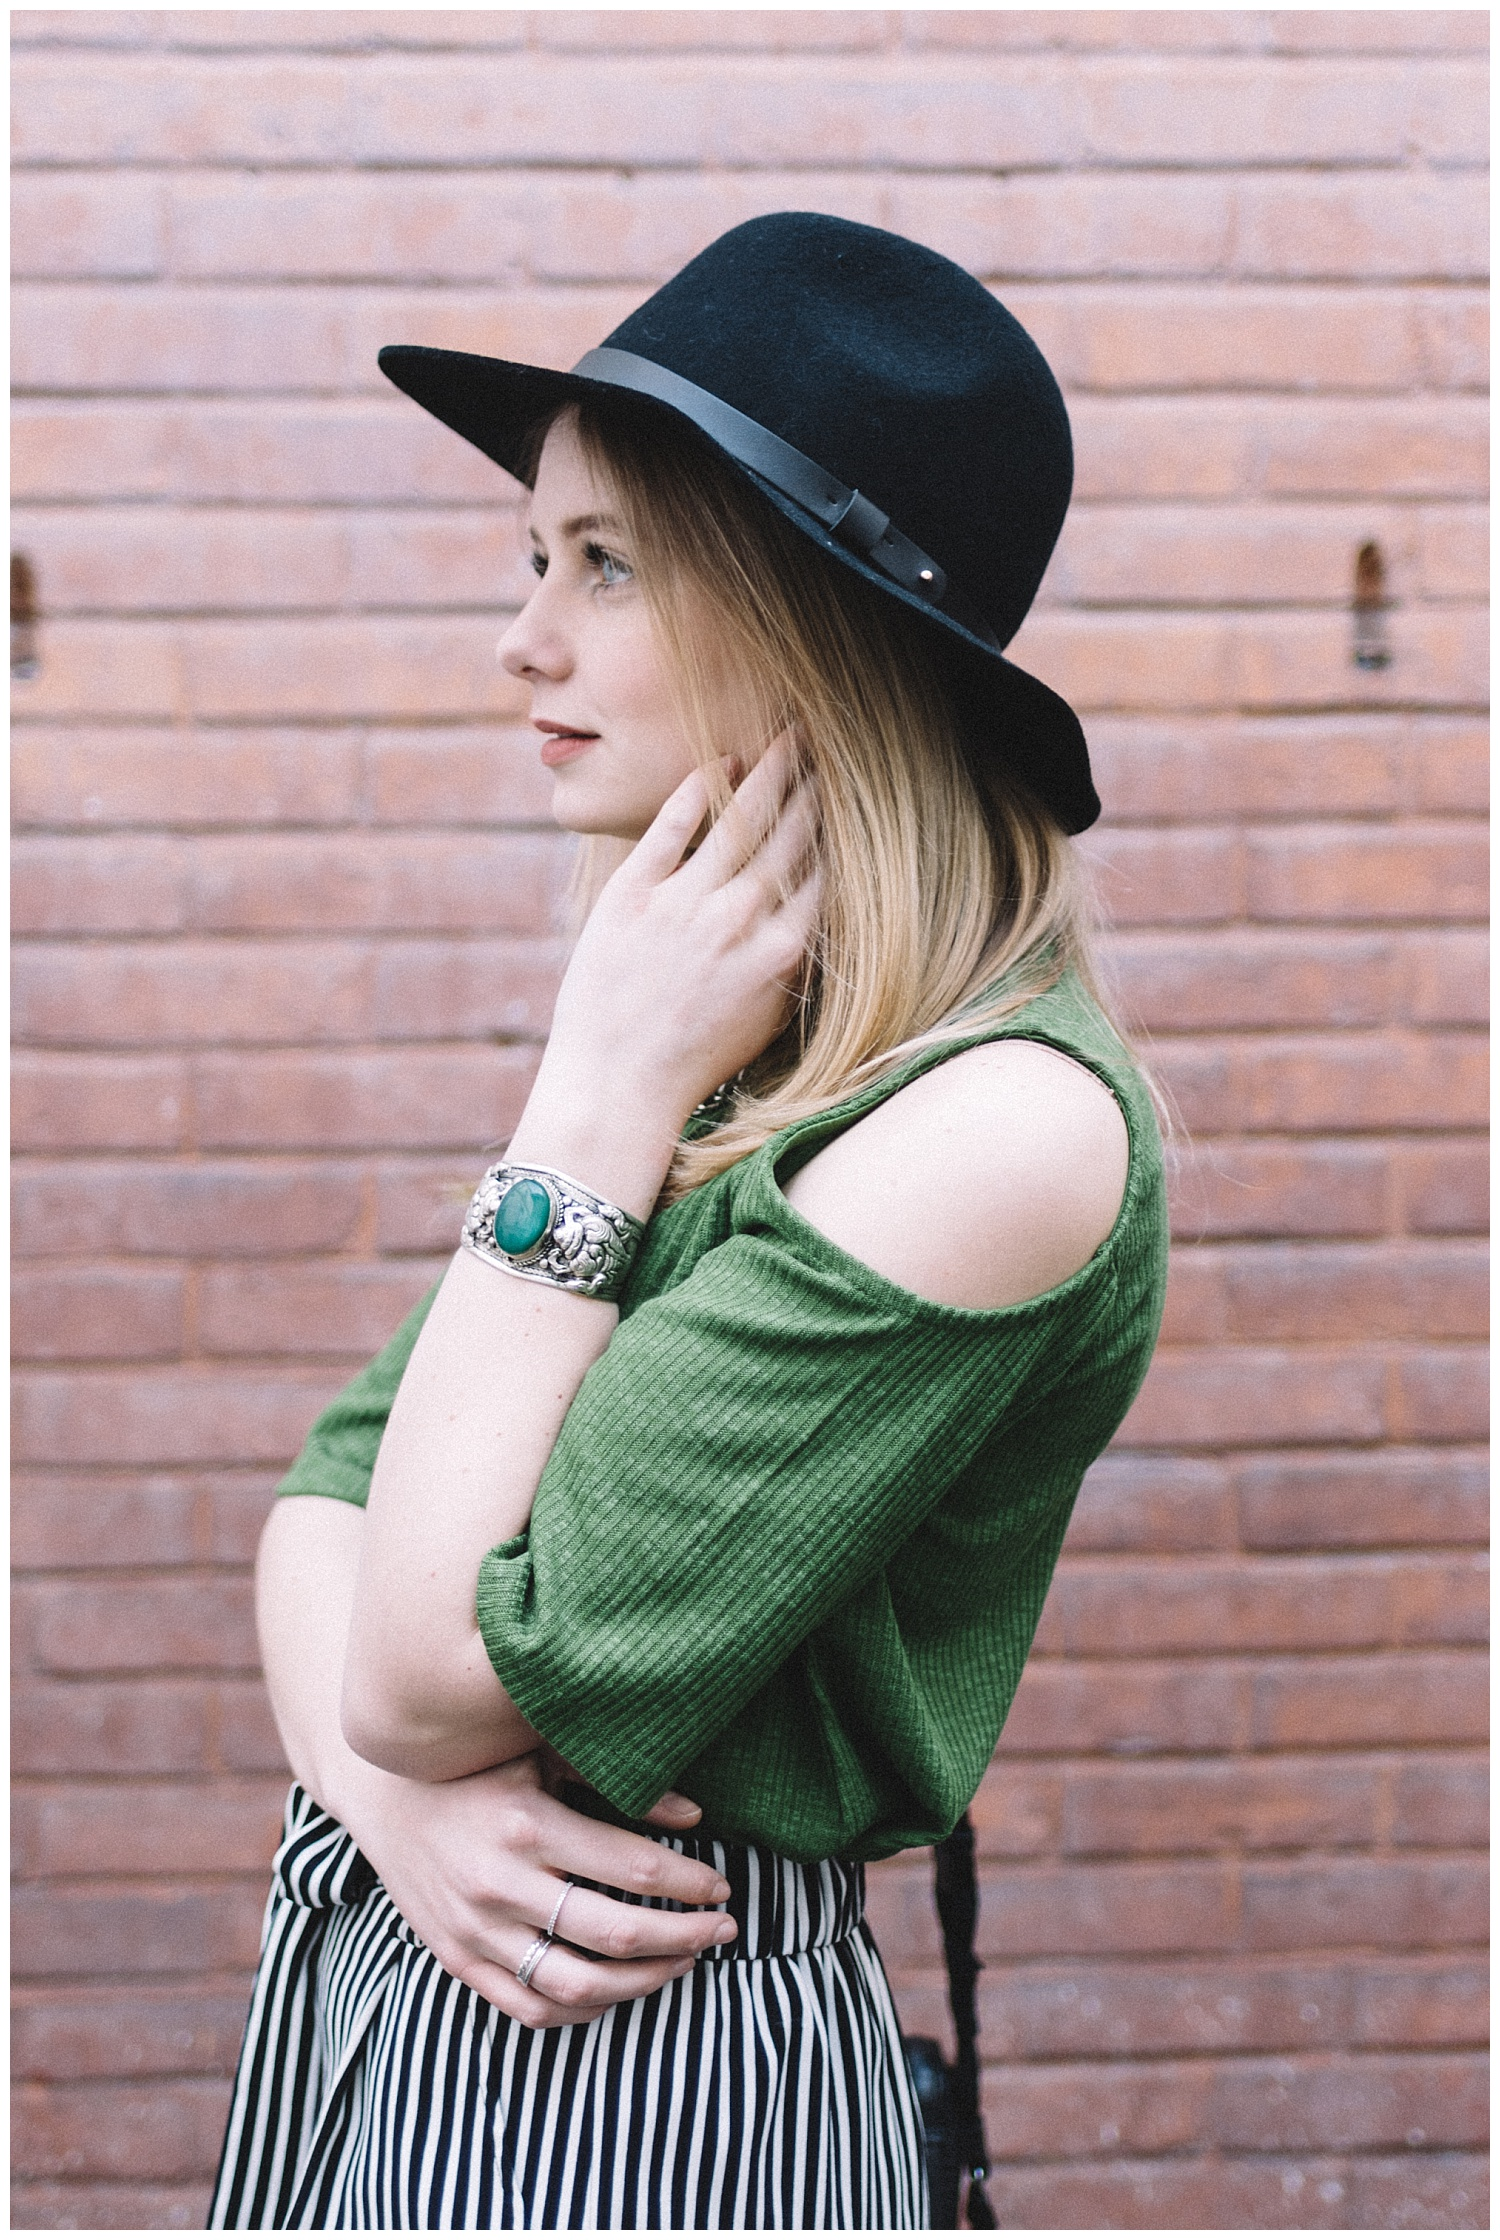 Camille_Lookbook_Fashion_Gaetan_Jargot_0006.jpg